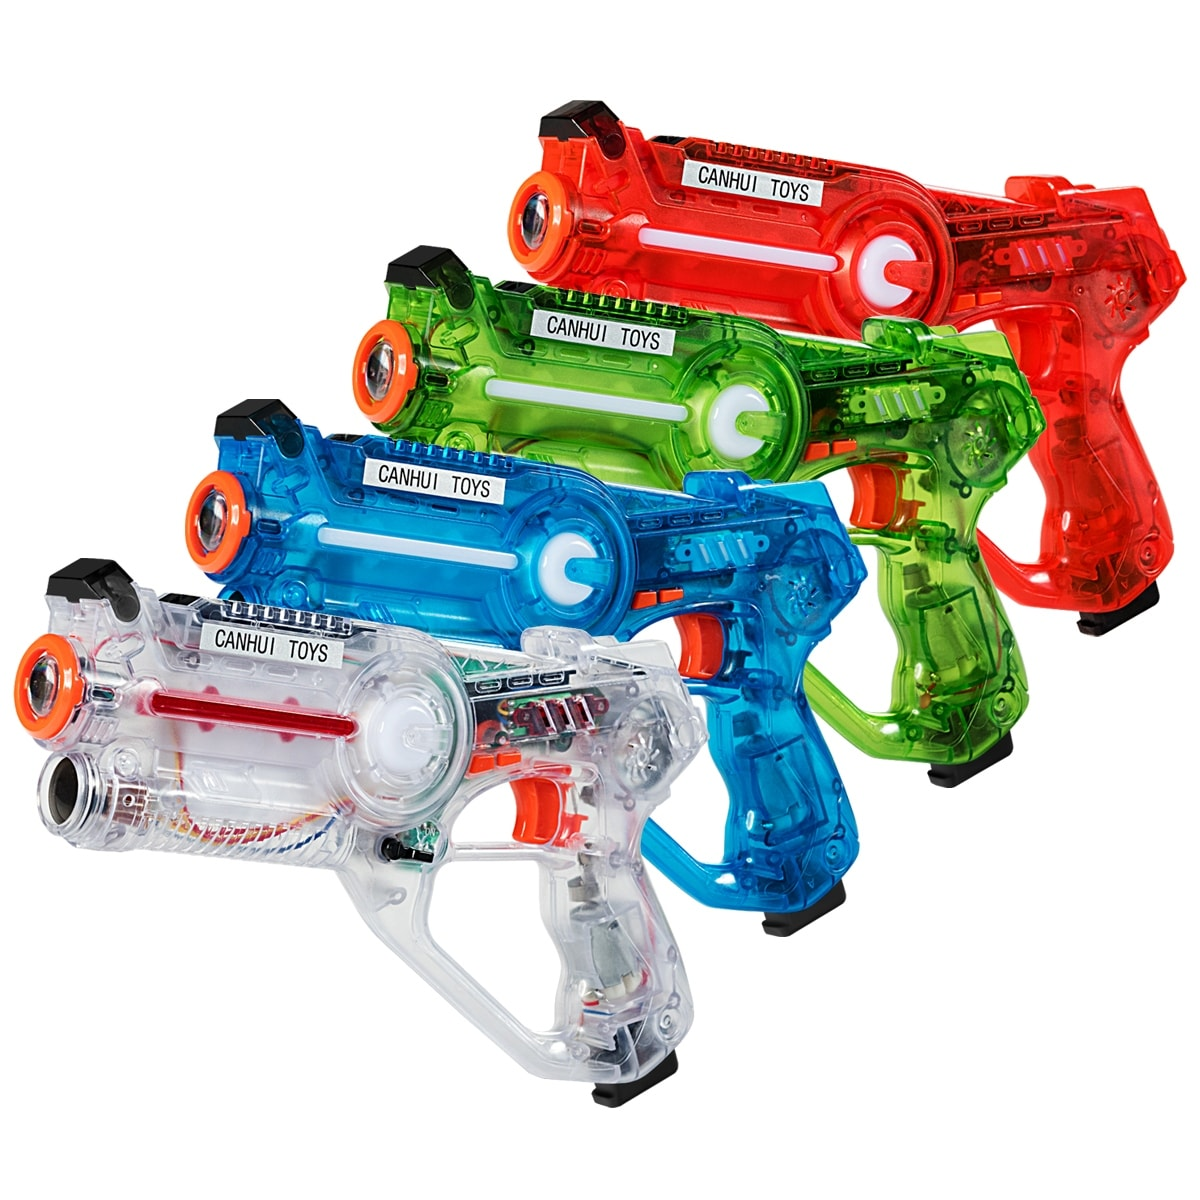 Laser Pistol Gun Set With Electronic Target Lights /& Music Interactive Game Toy